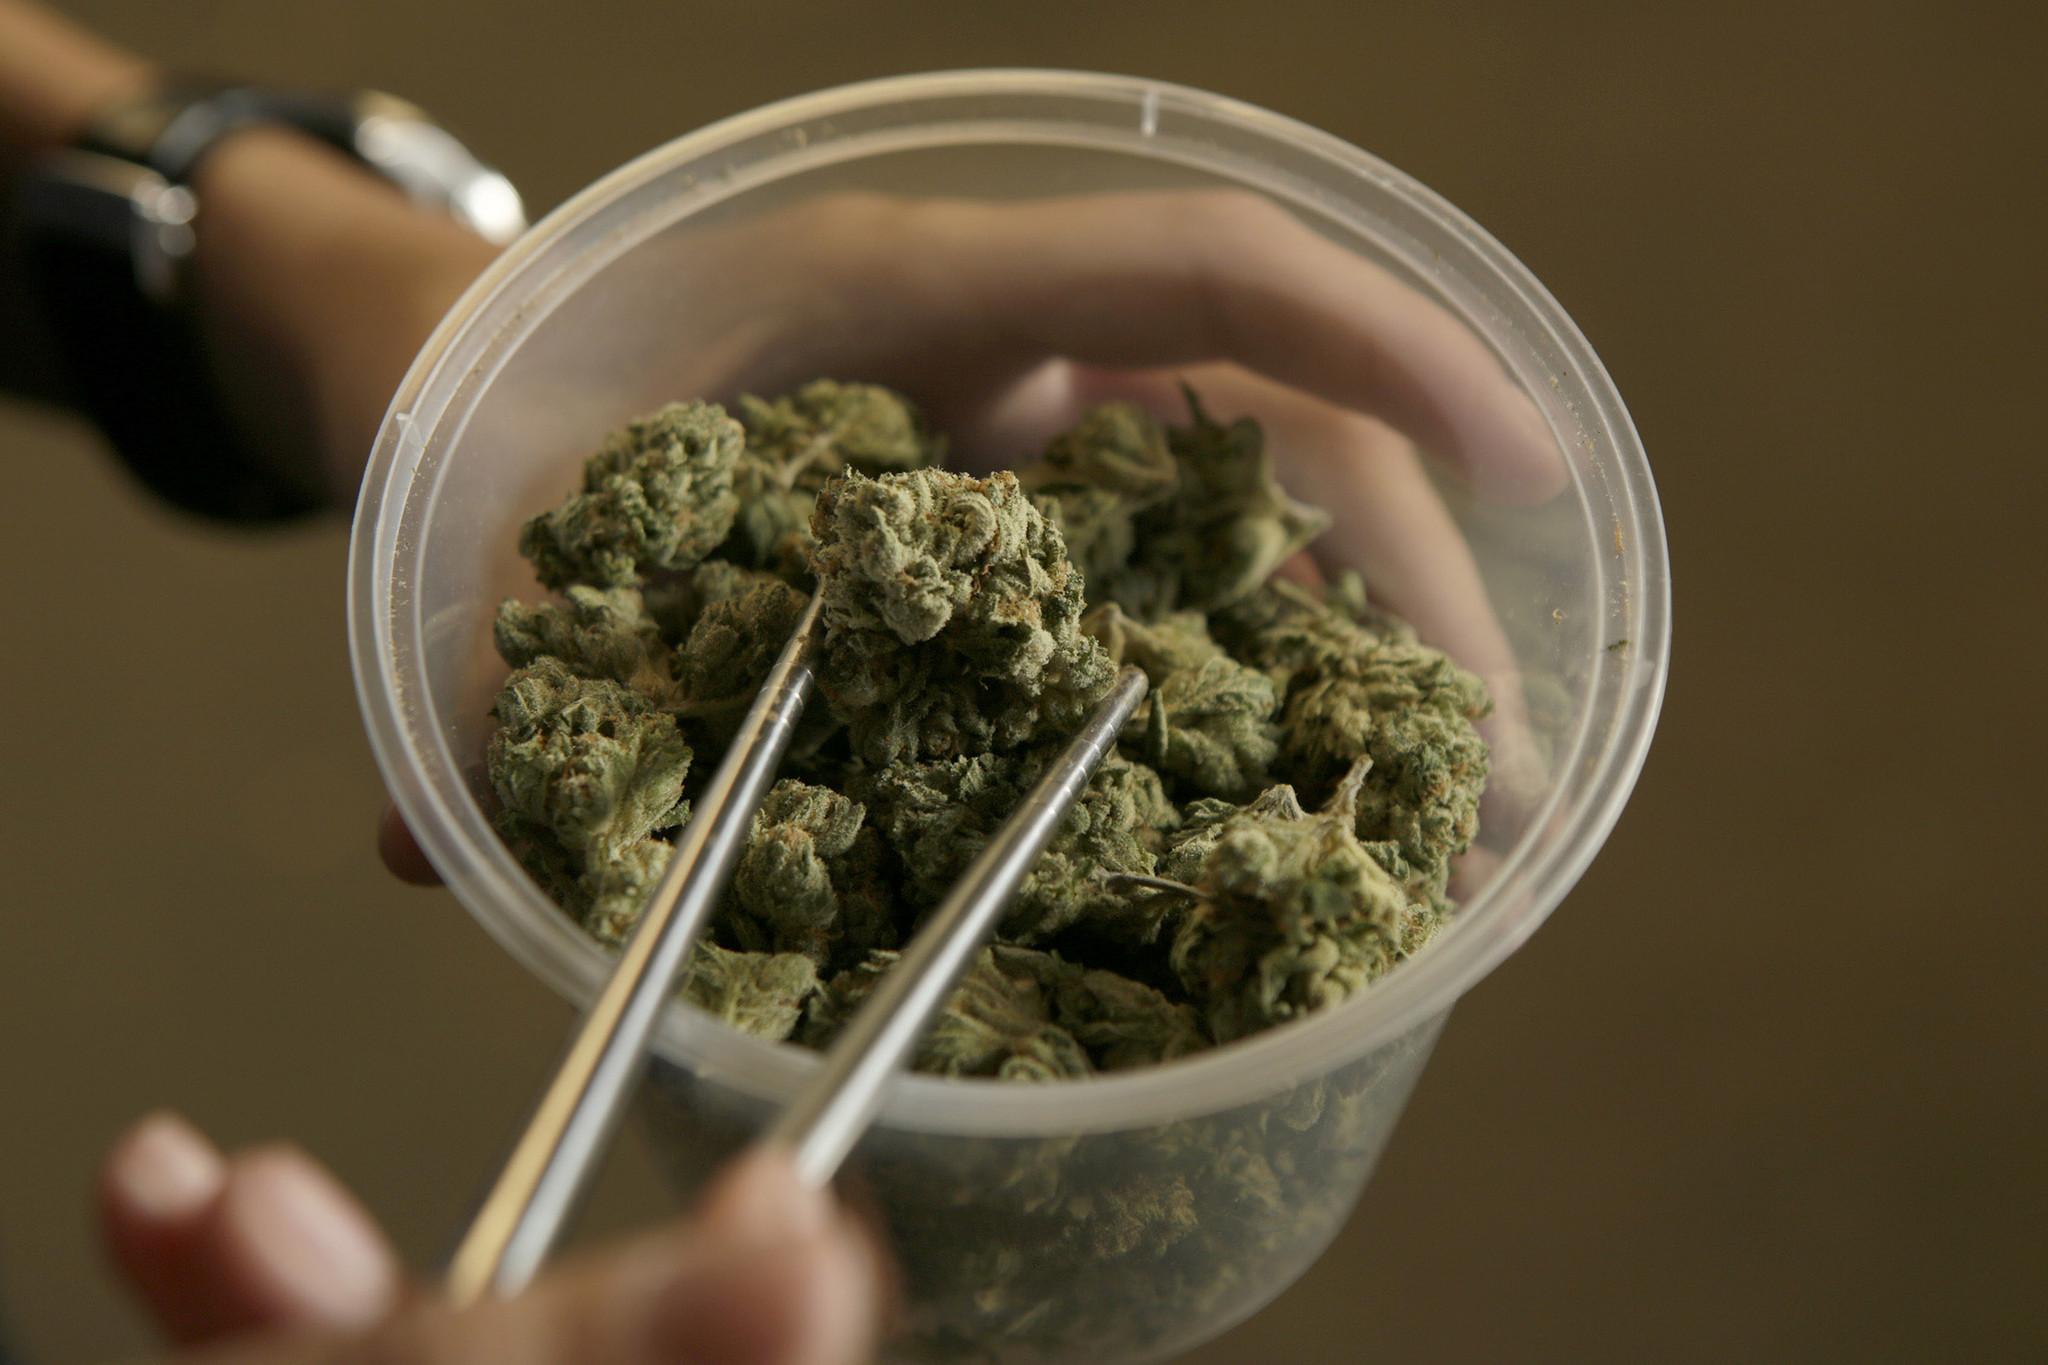 San diego marijuana dating